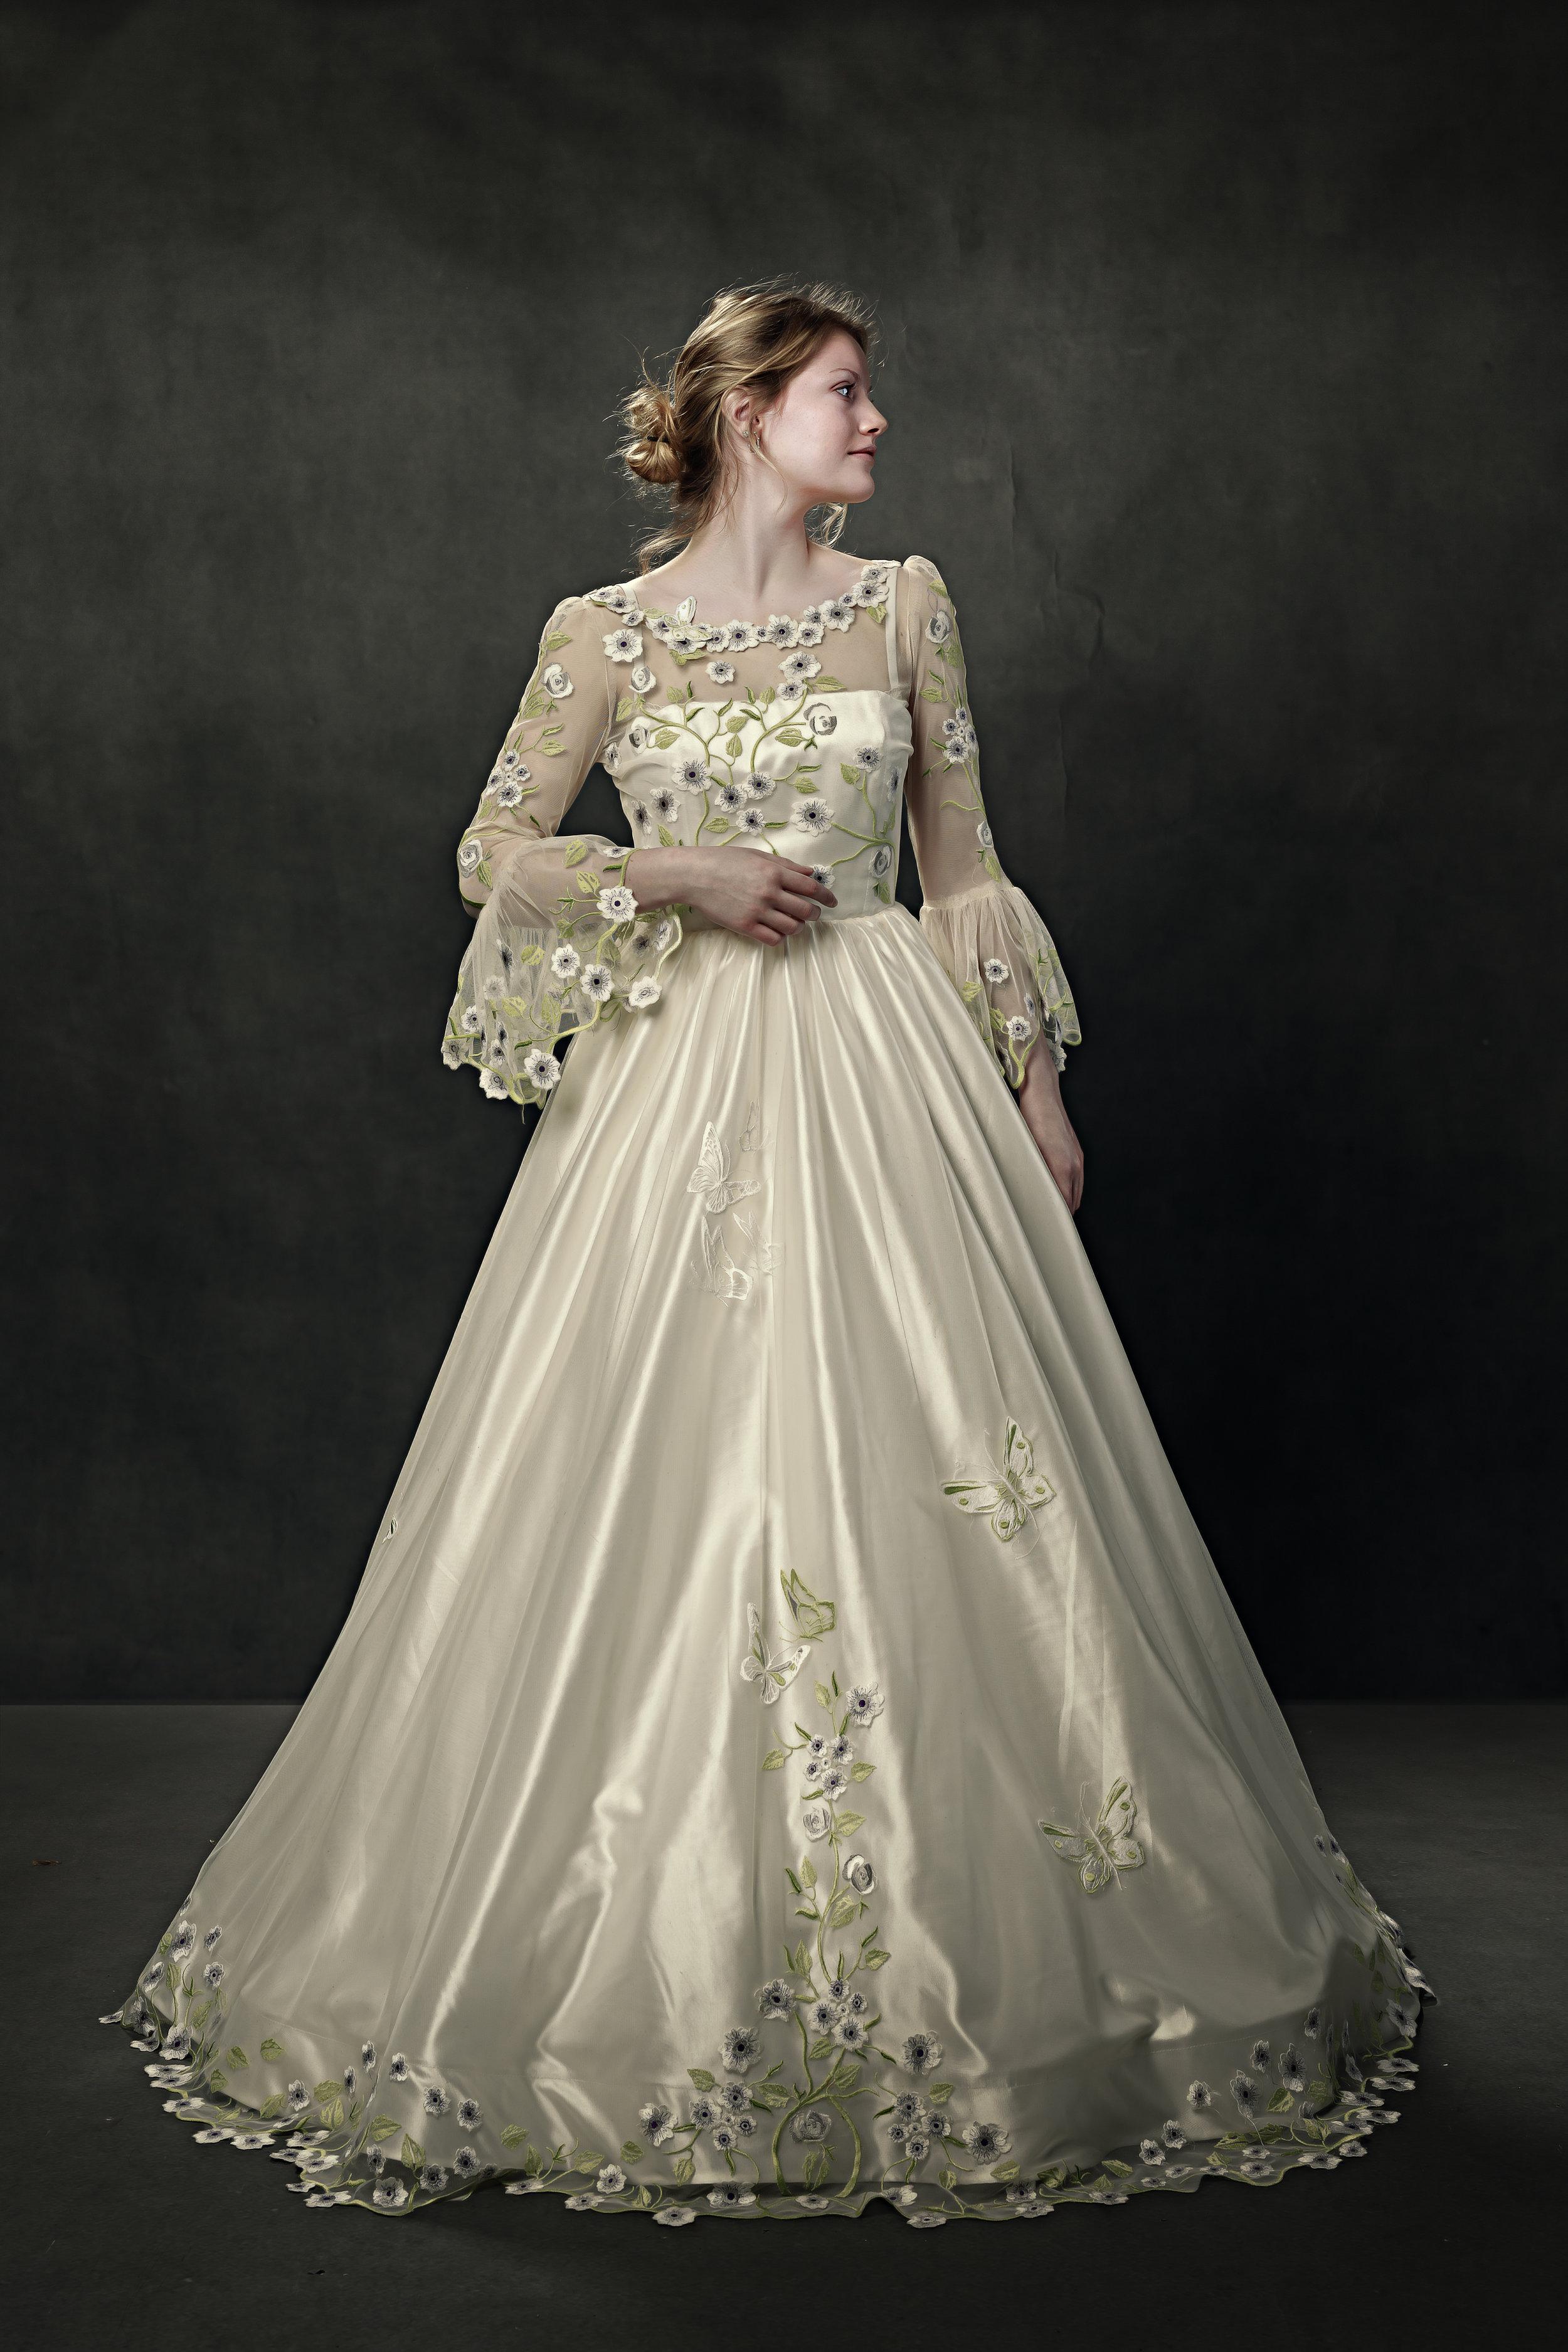 martin dobson wedding dress - 0128 - March 07, 2018 - copyright Foyers Photography-Edit.jpg